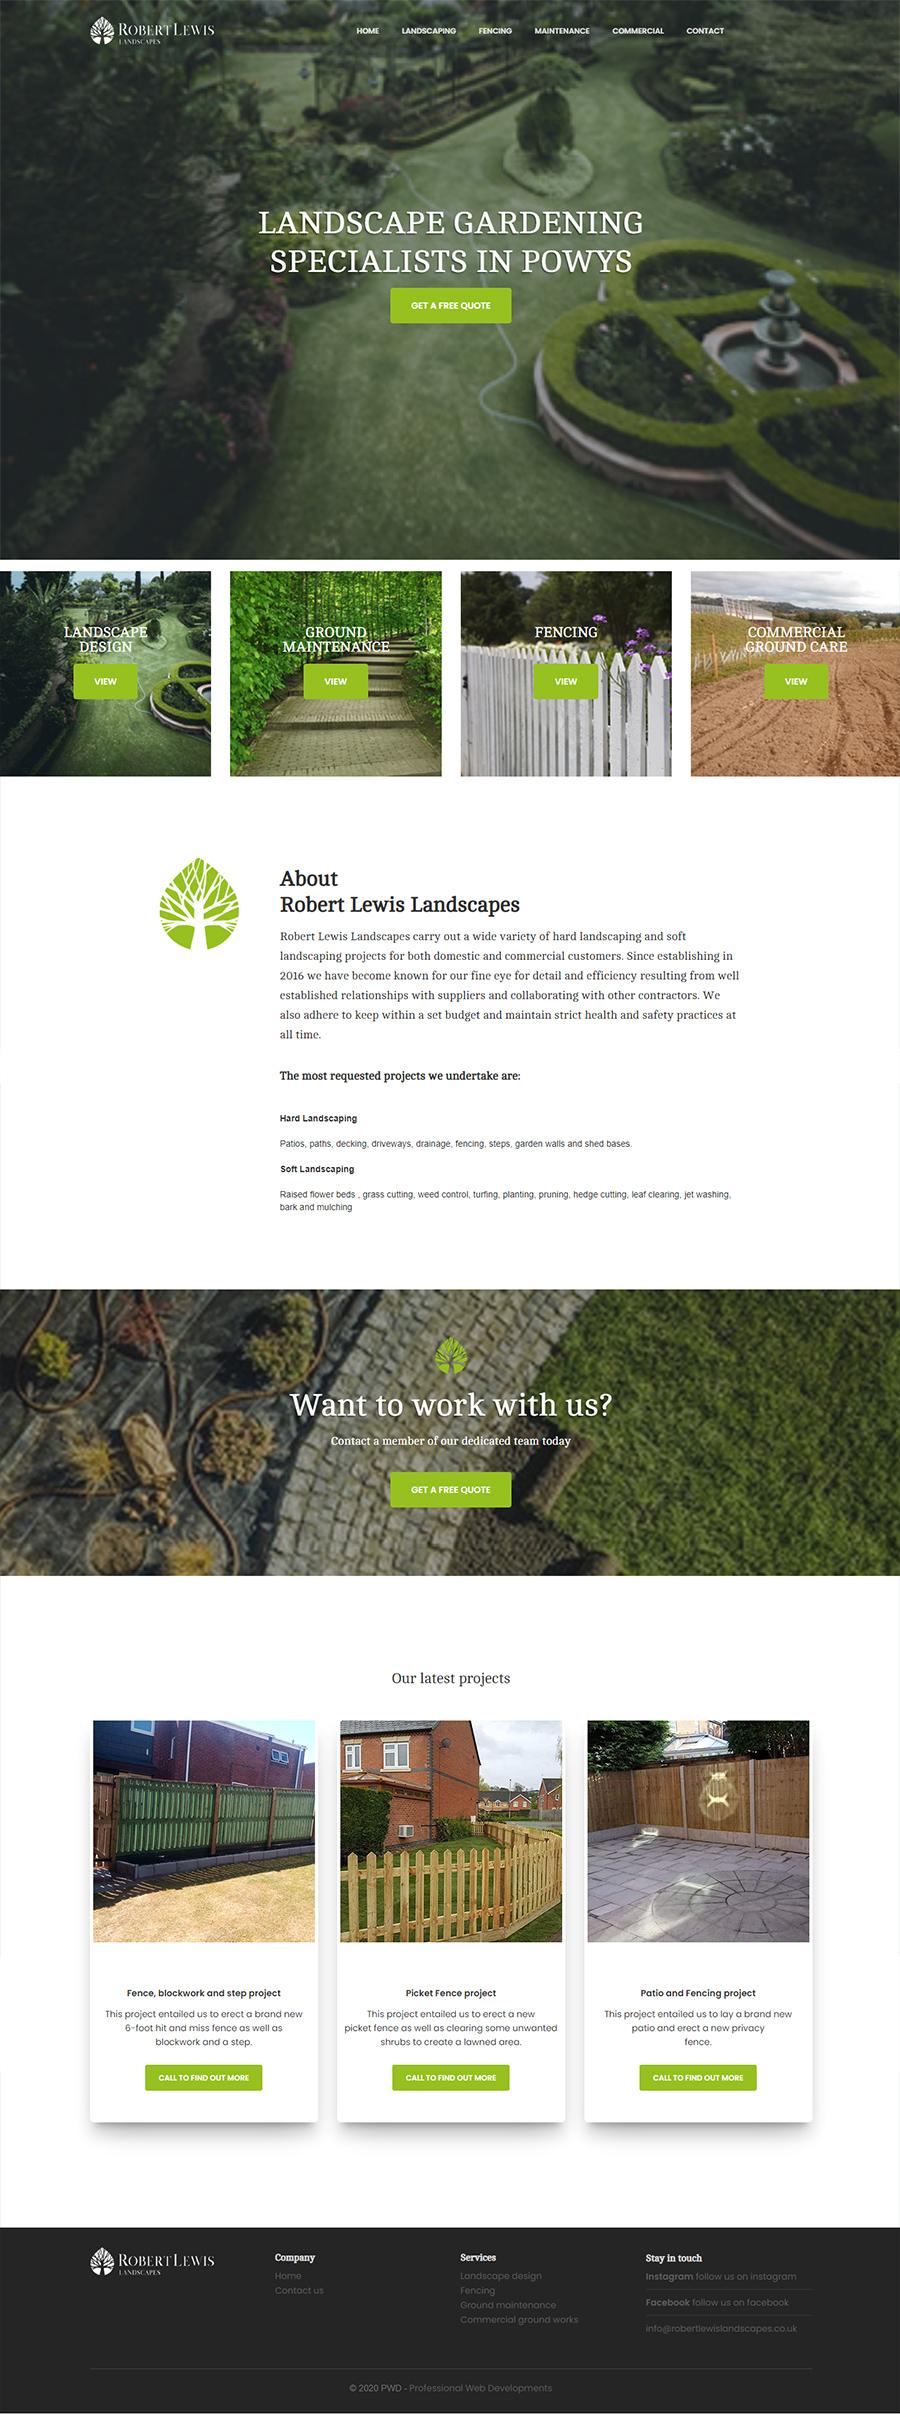 robert lewis landscapes Website Design & Development